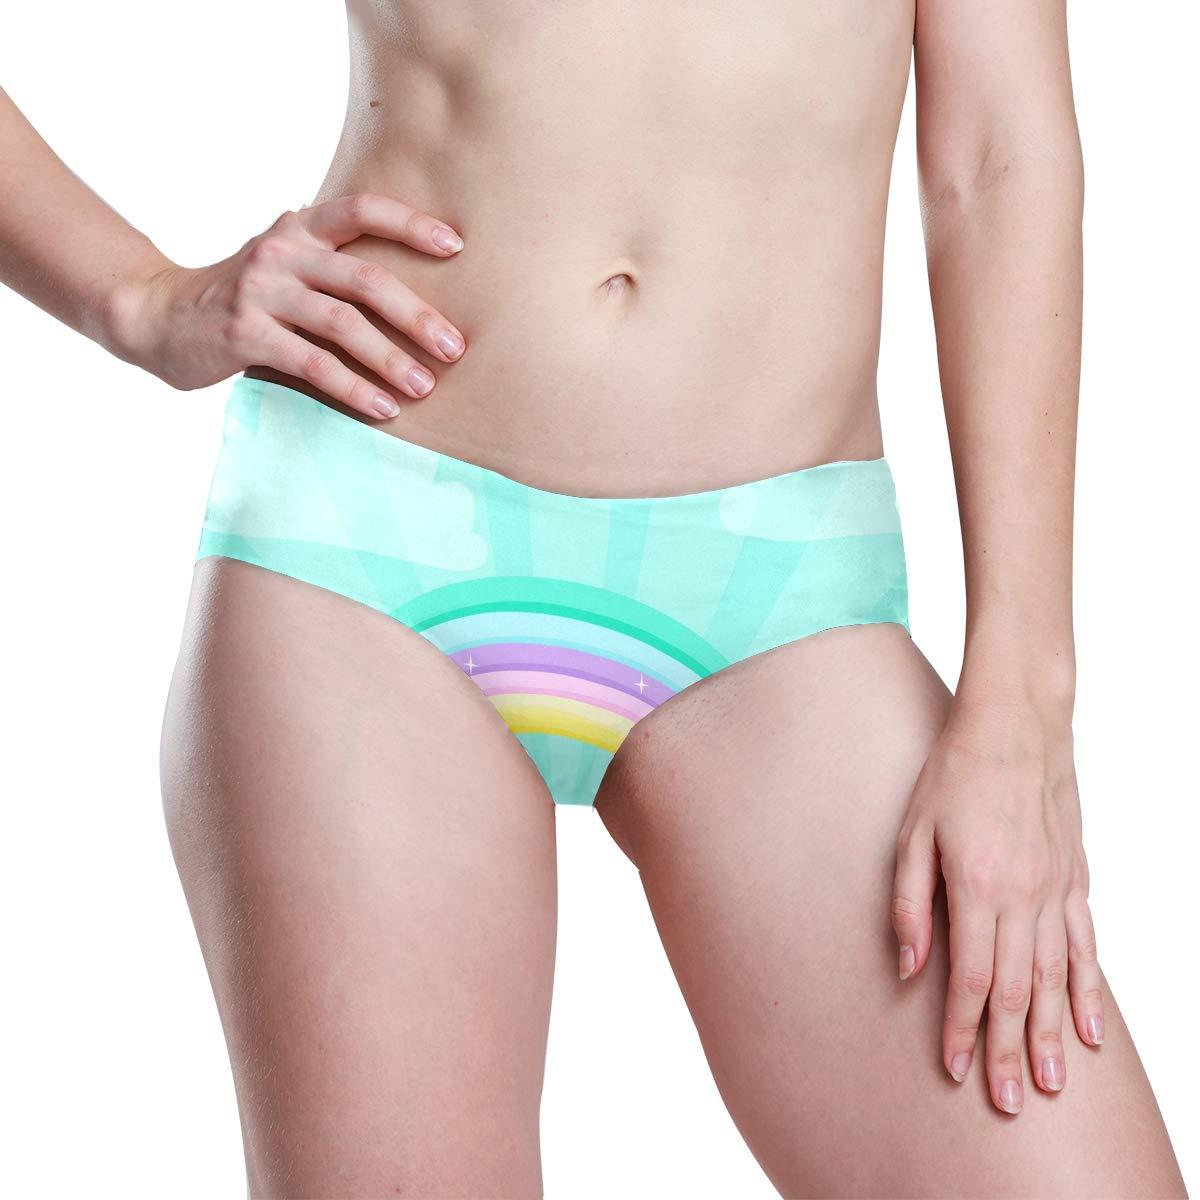 FAJRO Essentials Womens Stretch Panties Rainbow Sparkling Cute Panties